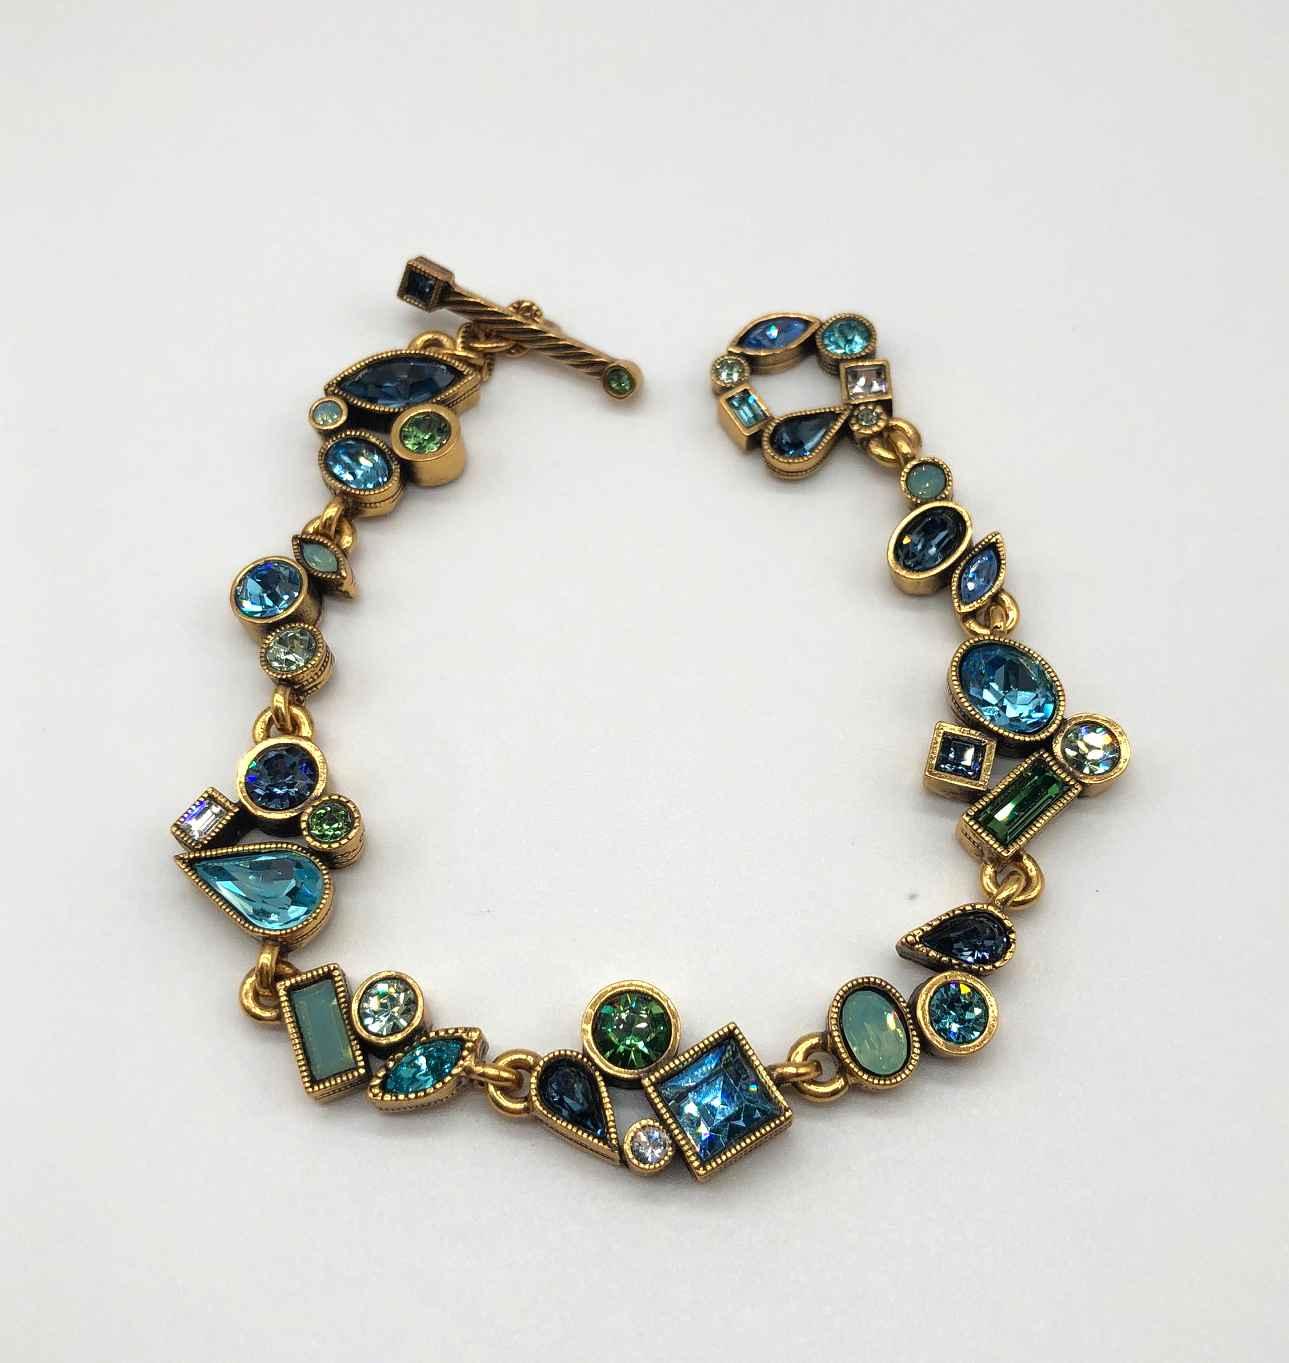 Wedding March Bracelet in Gold, Zephyr